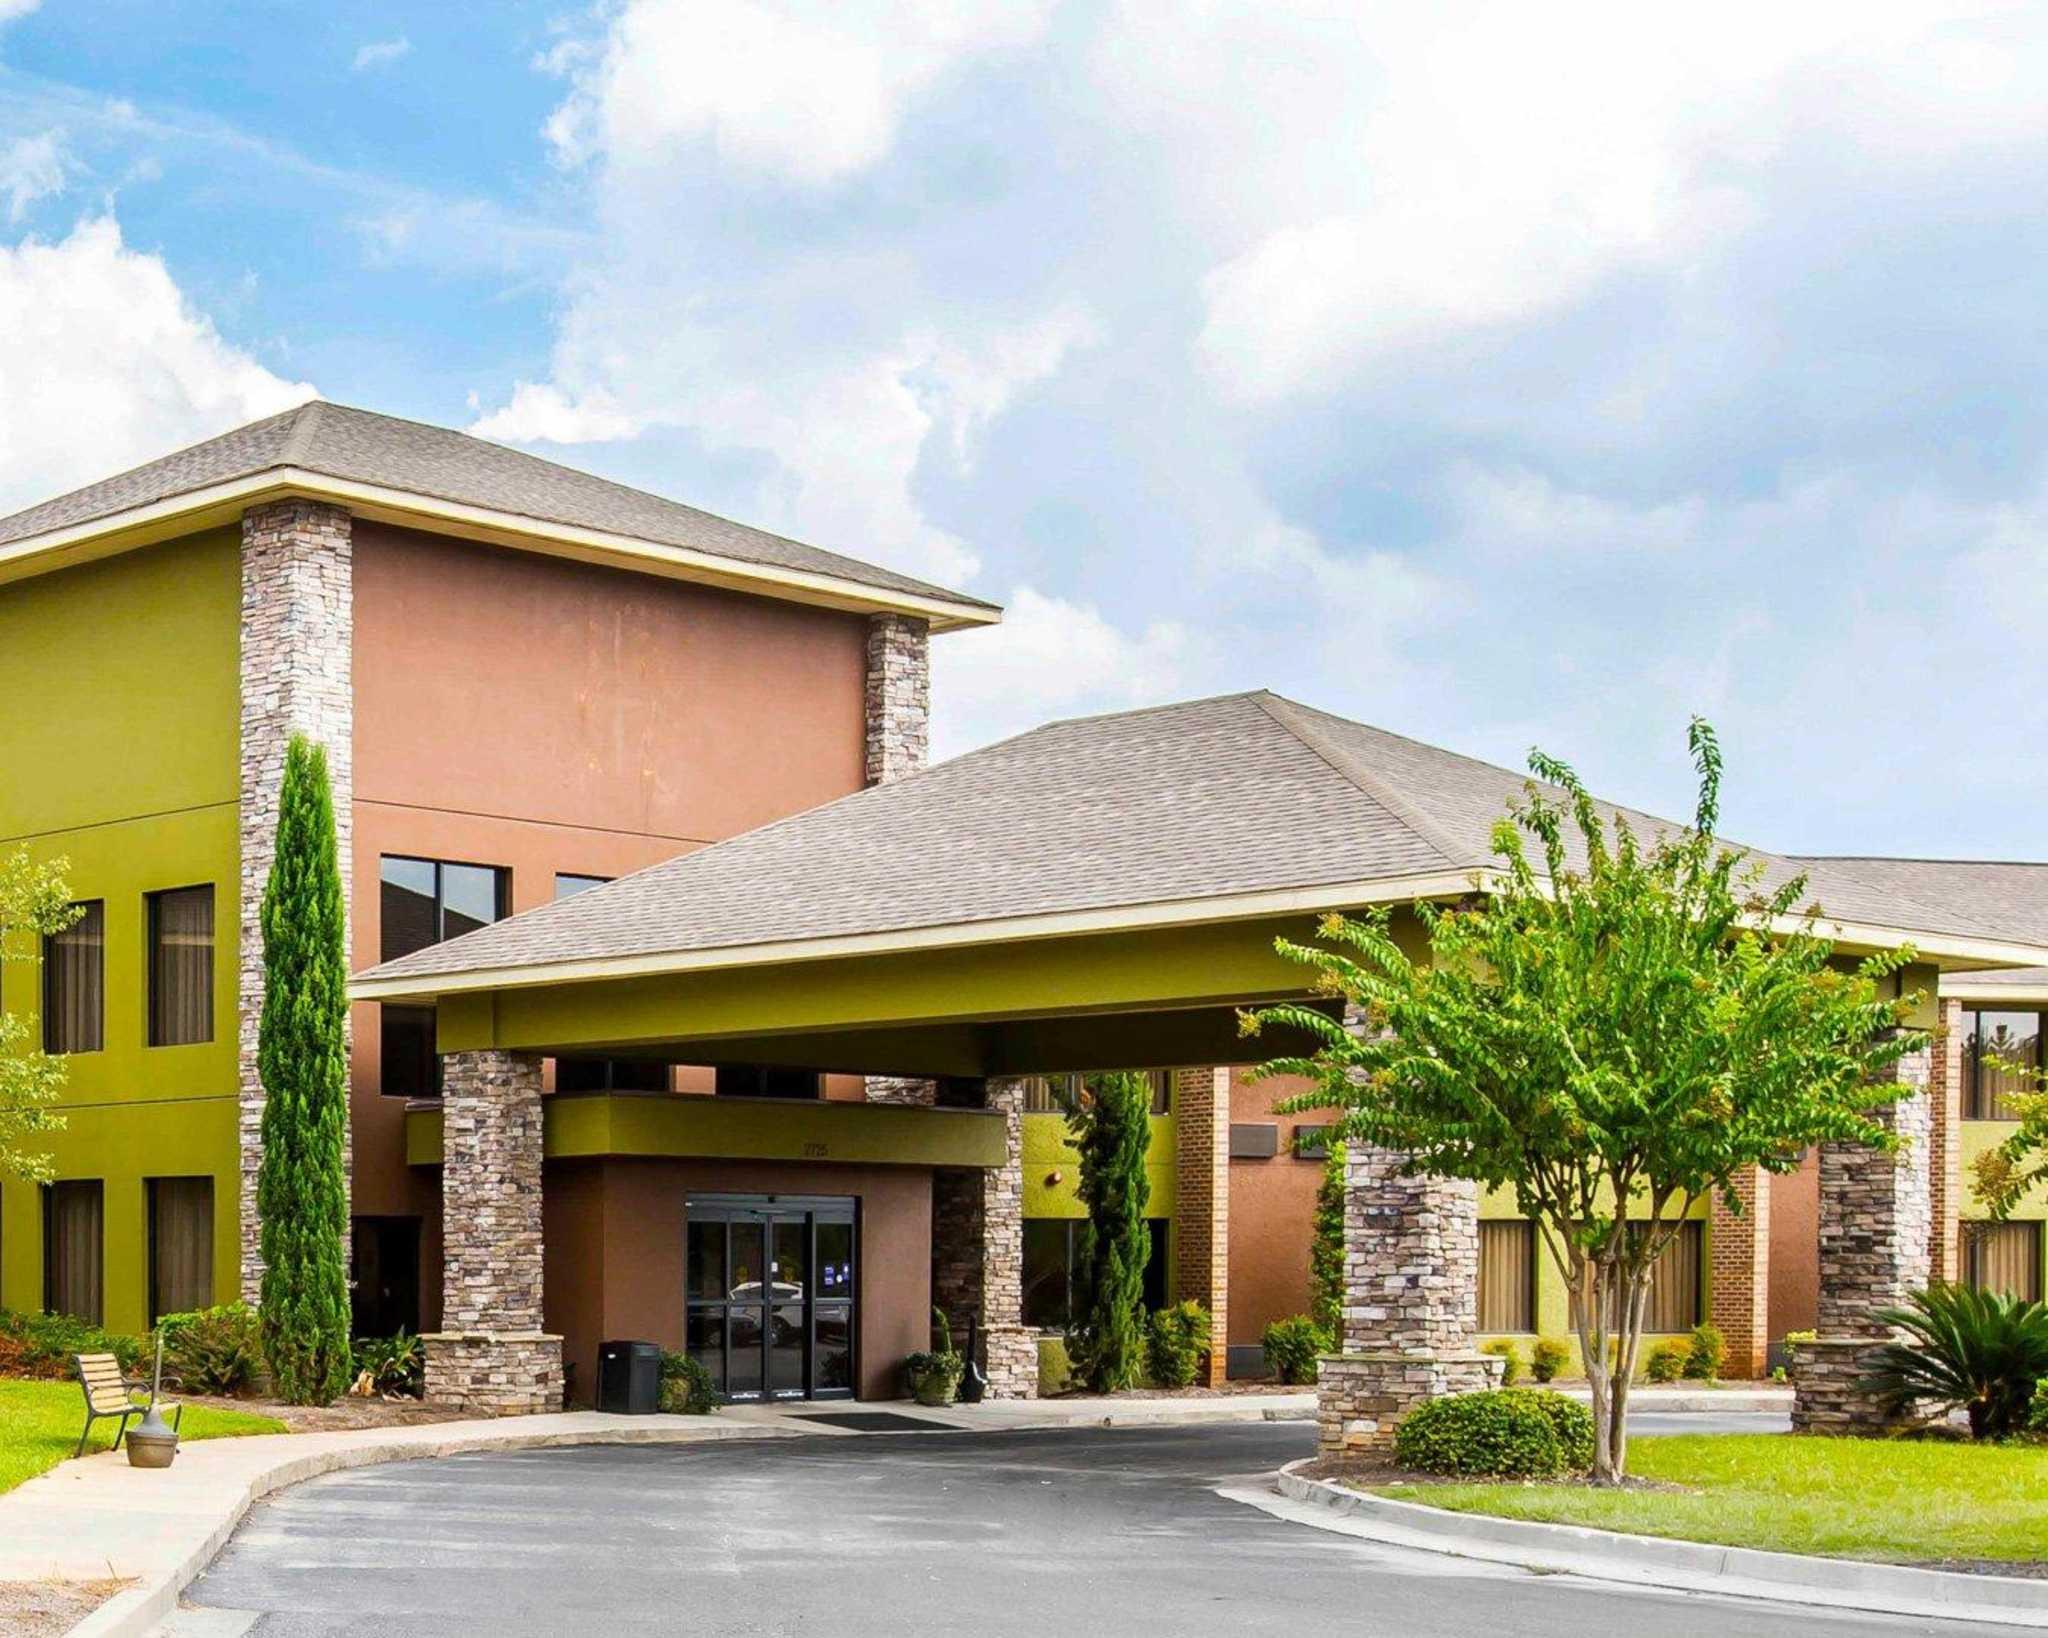 Comfort Inn in Warner Robins, GA - (478) 953-3...